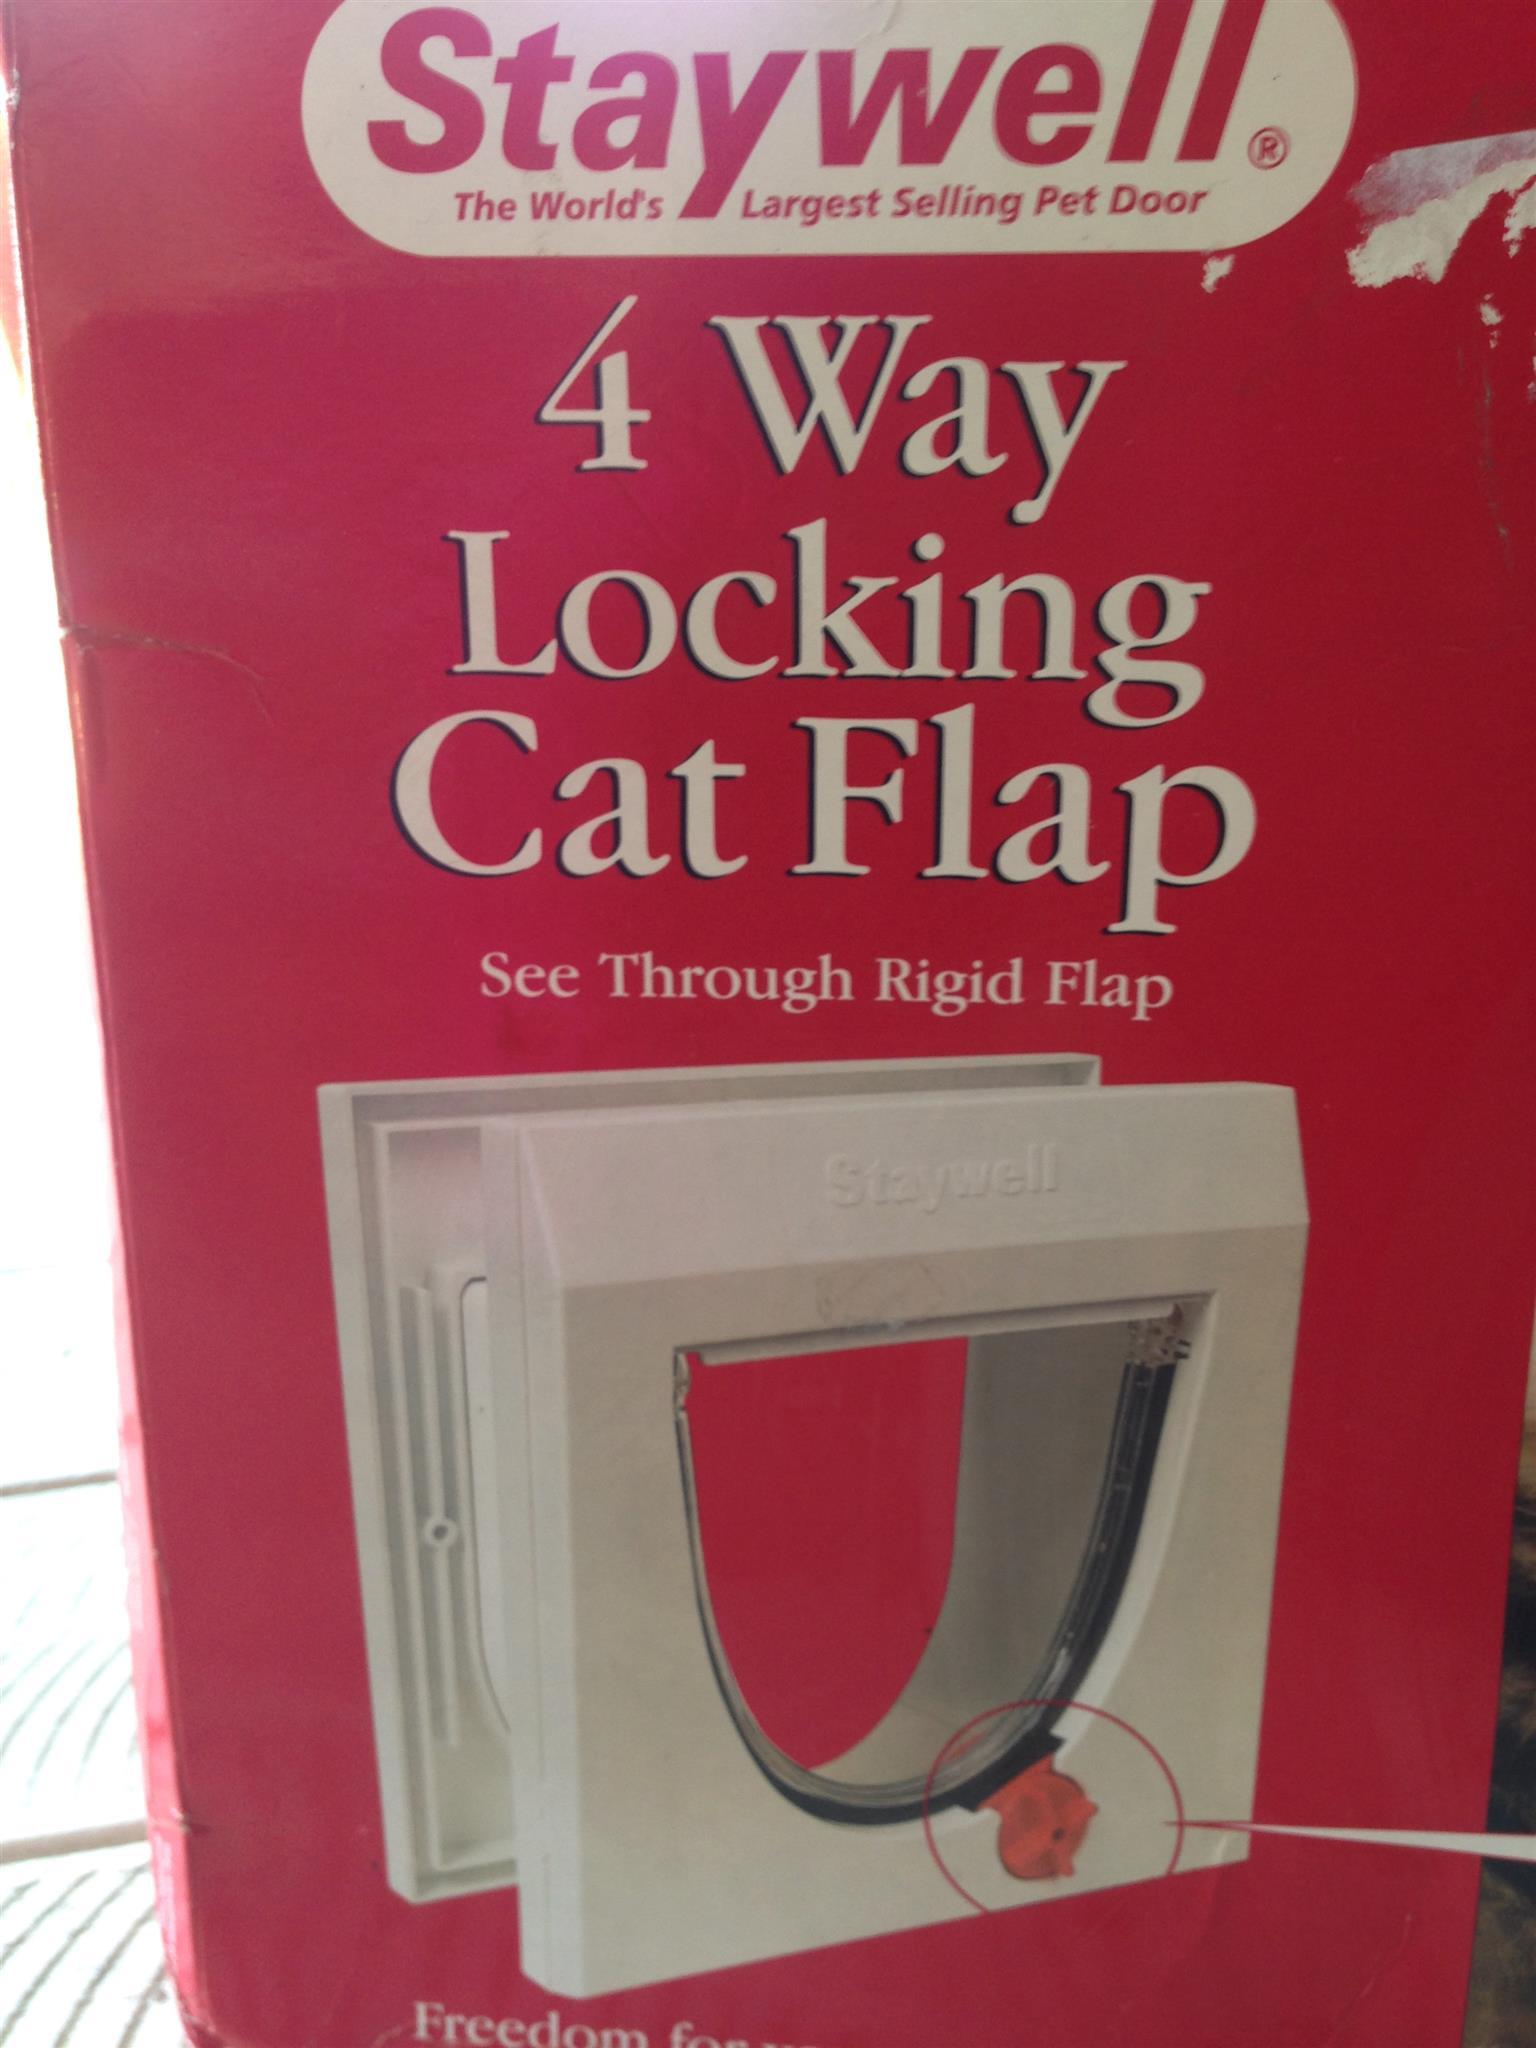 4 Way Locking Cat Flap